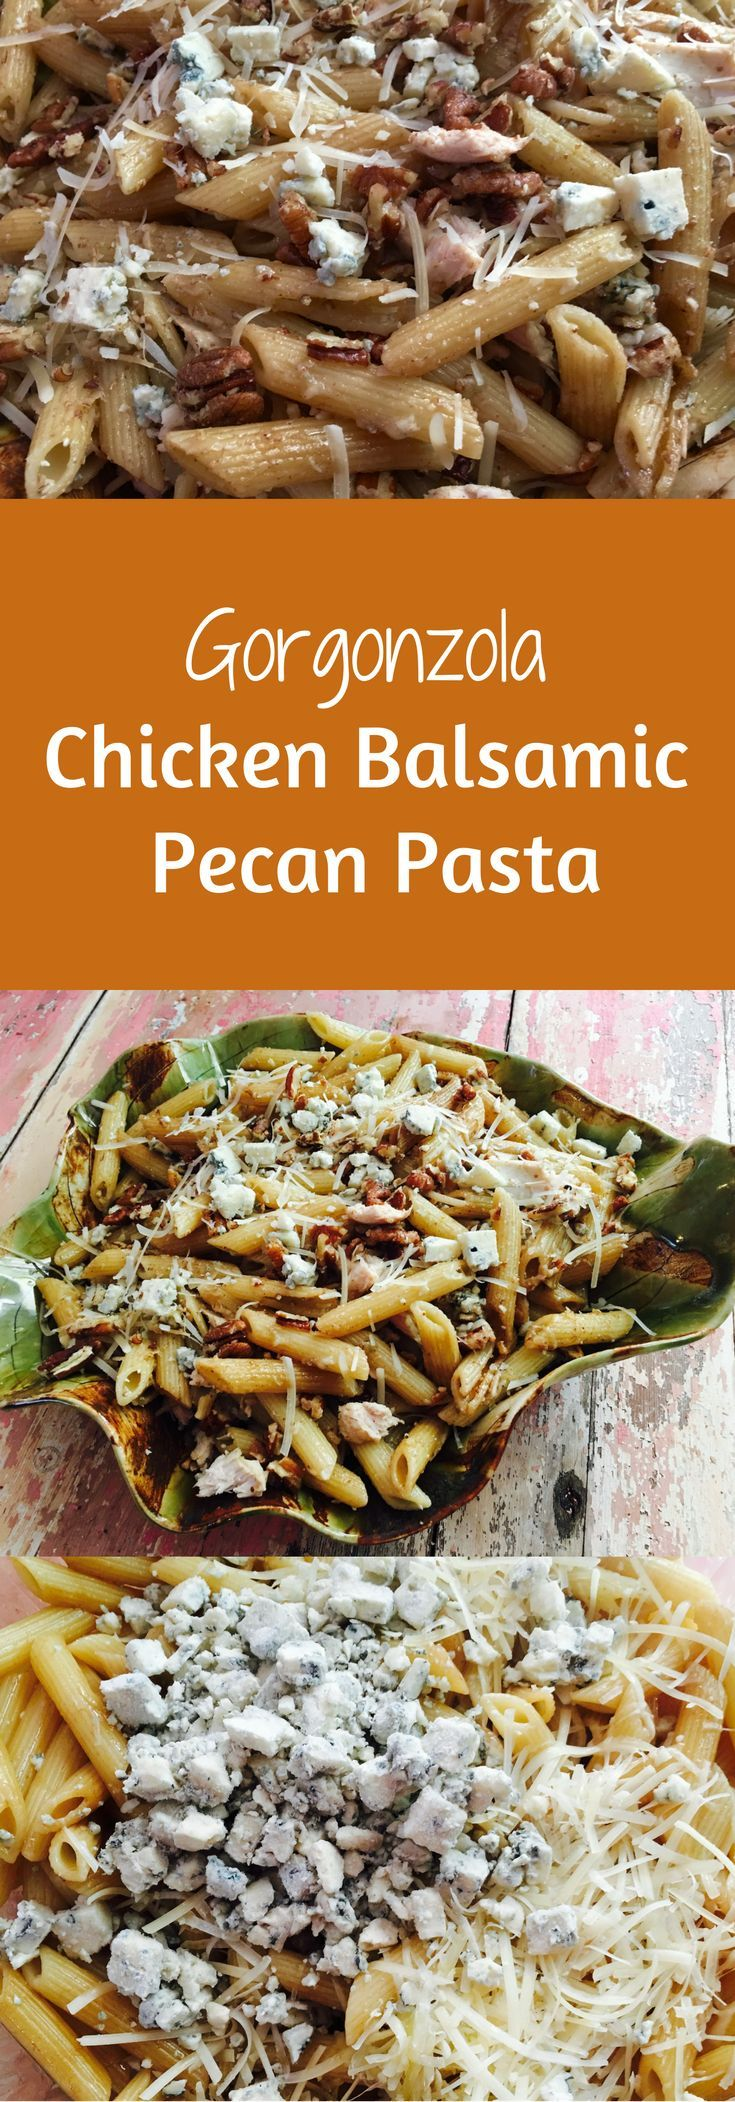 Gorgonzola Chicken Balsamic Pecan Pasta Recipe - Mouthwatering cheesy pasta recipe that everyone will love!